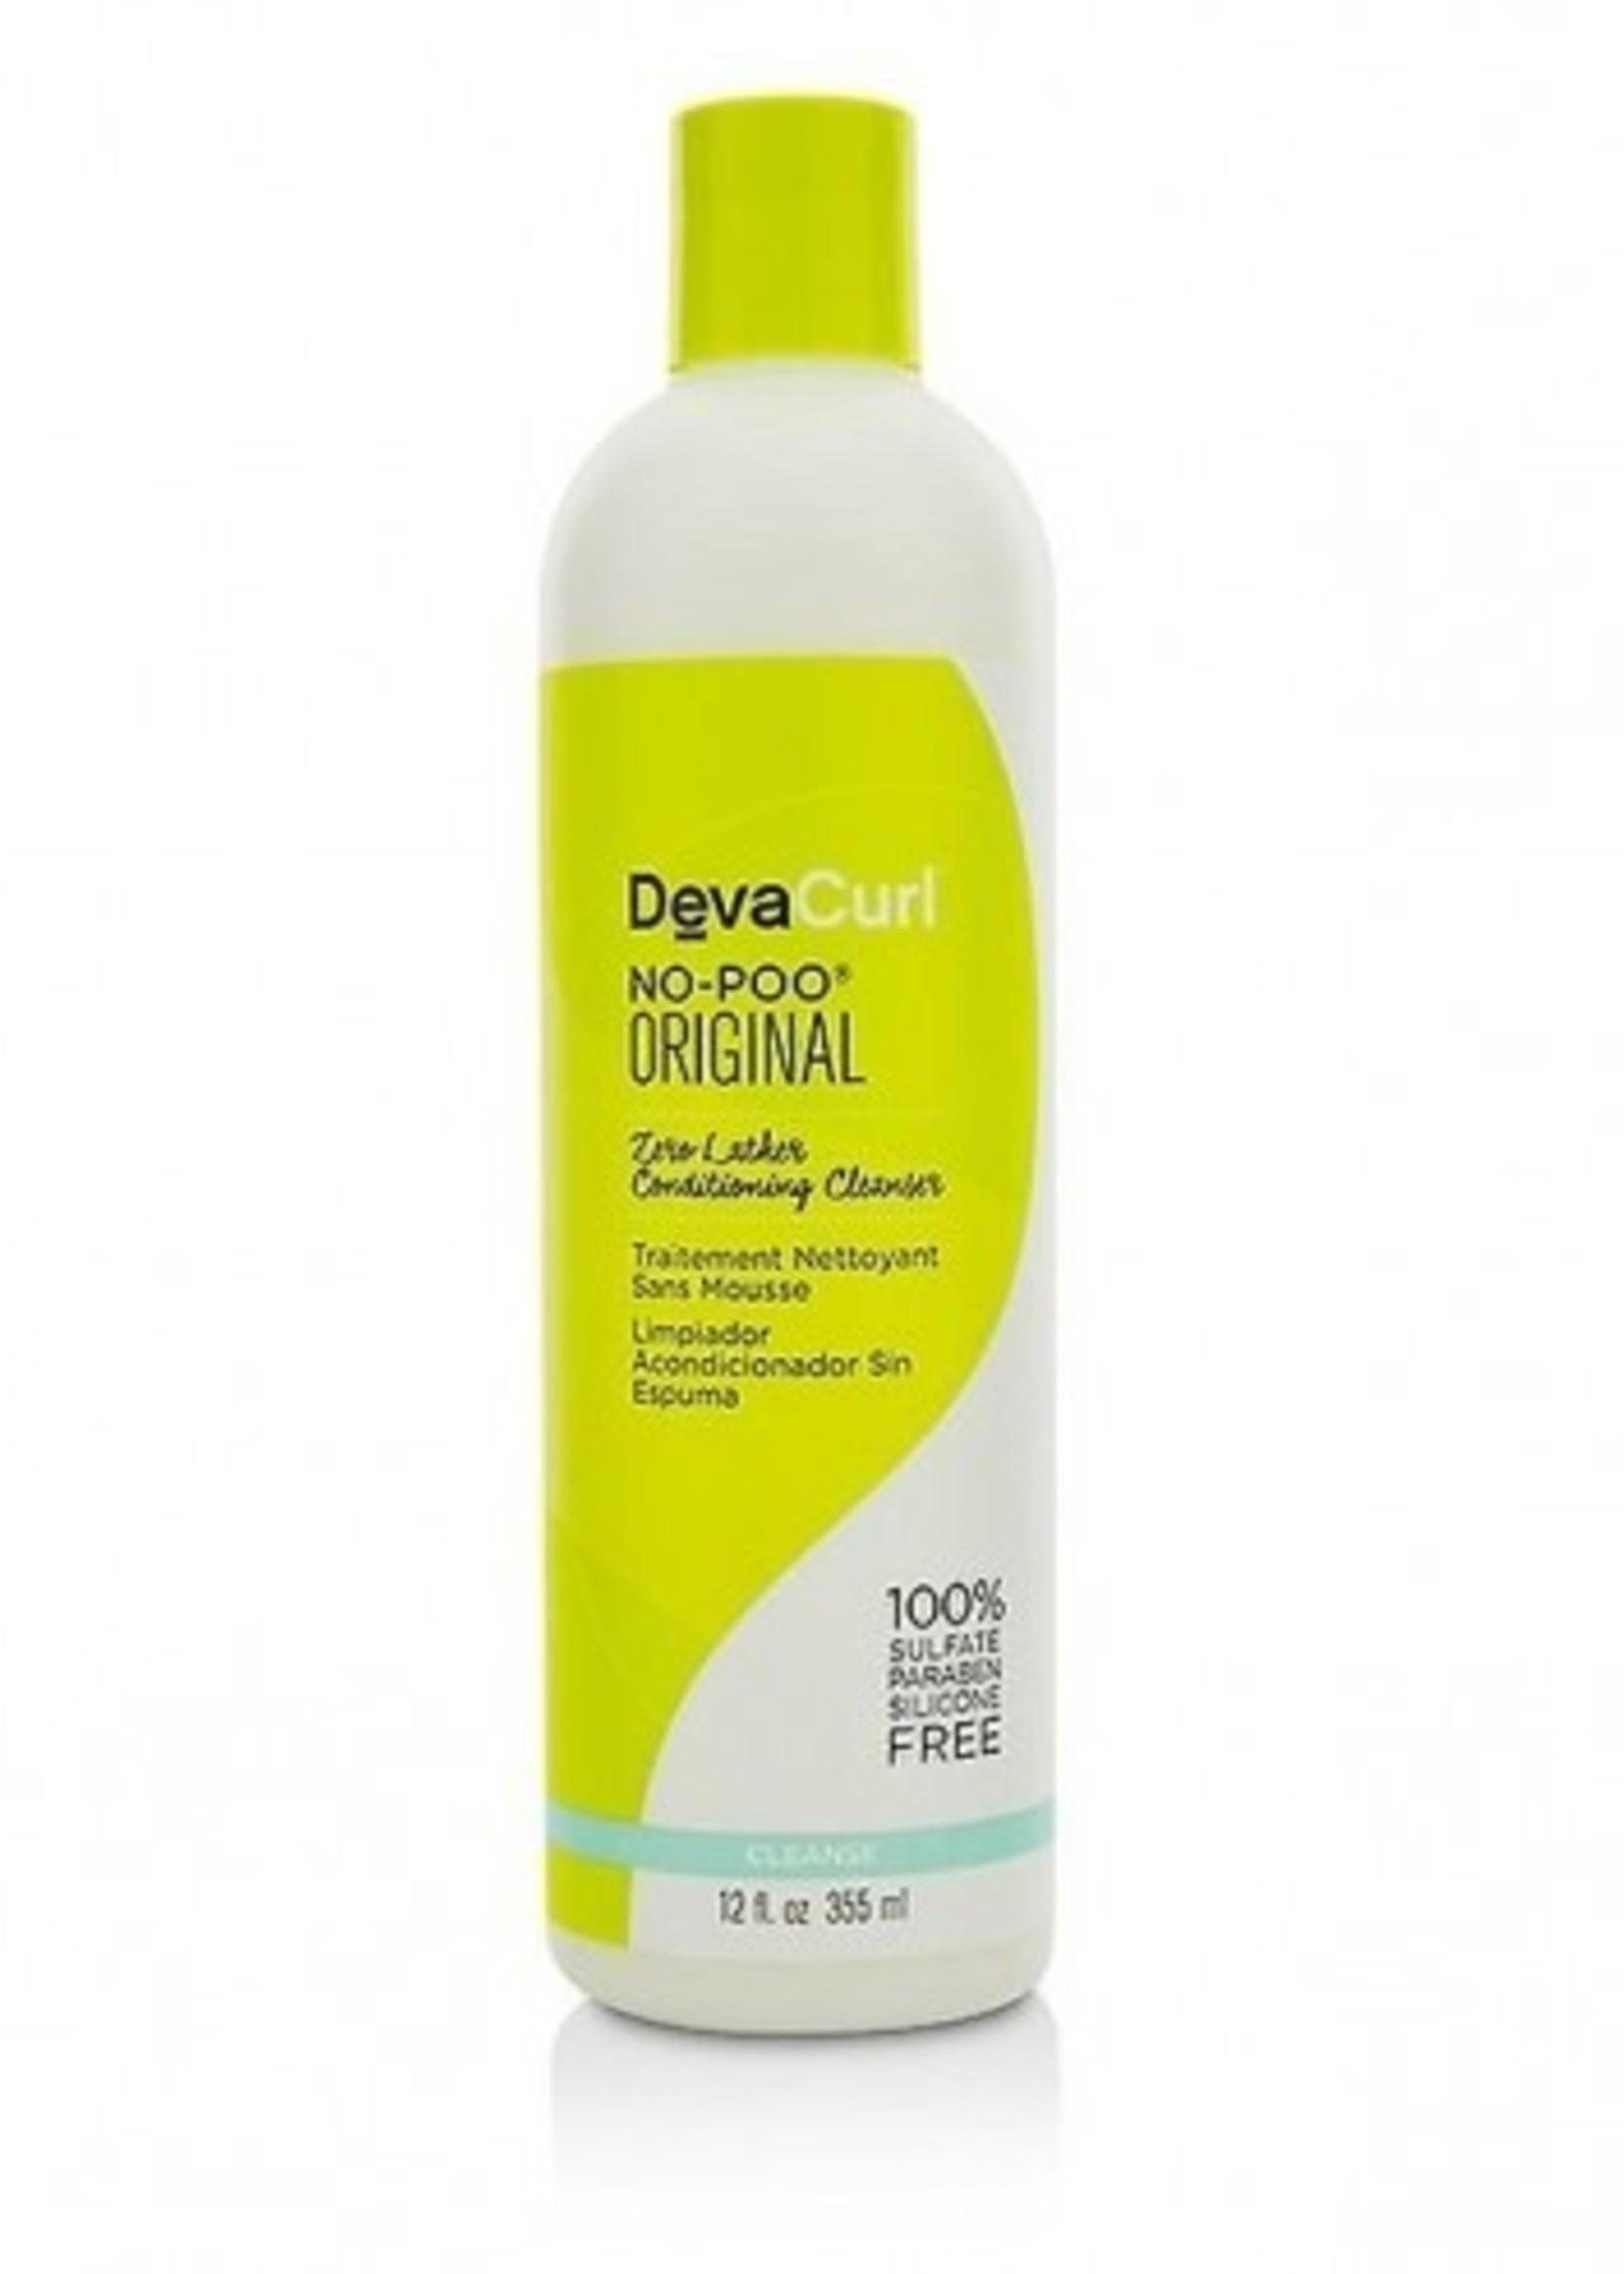 DevaCurl DevaCurl - NO-POO ORIGINAL ZERO LATHER CONDITIONING CLEANSER 355 ML